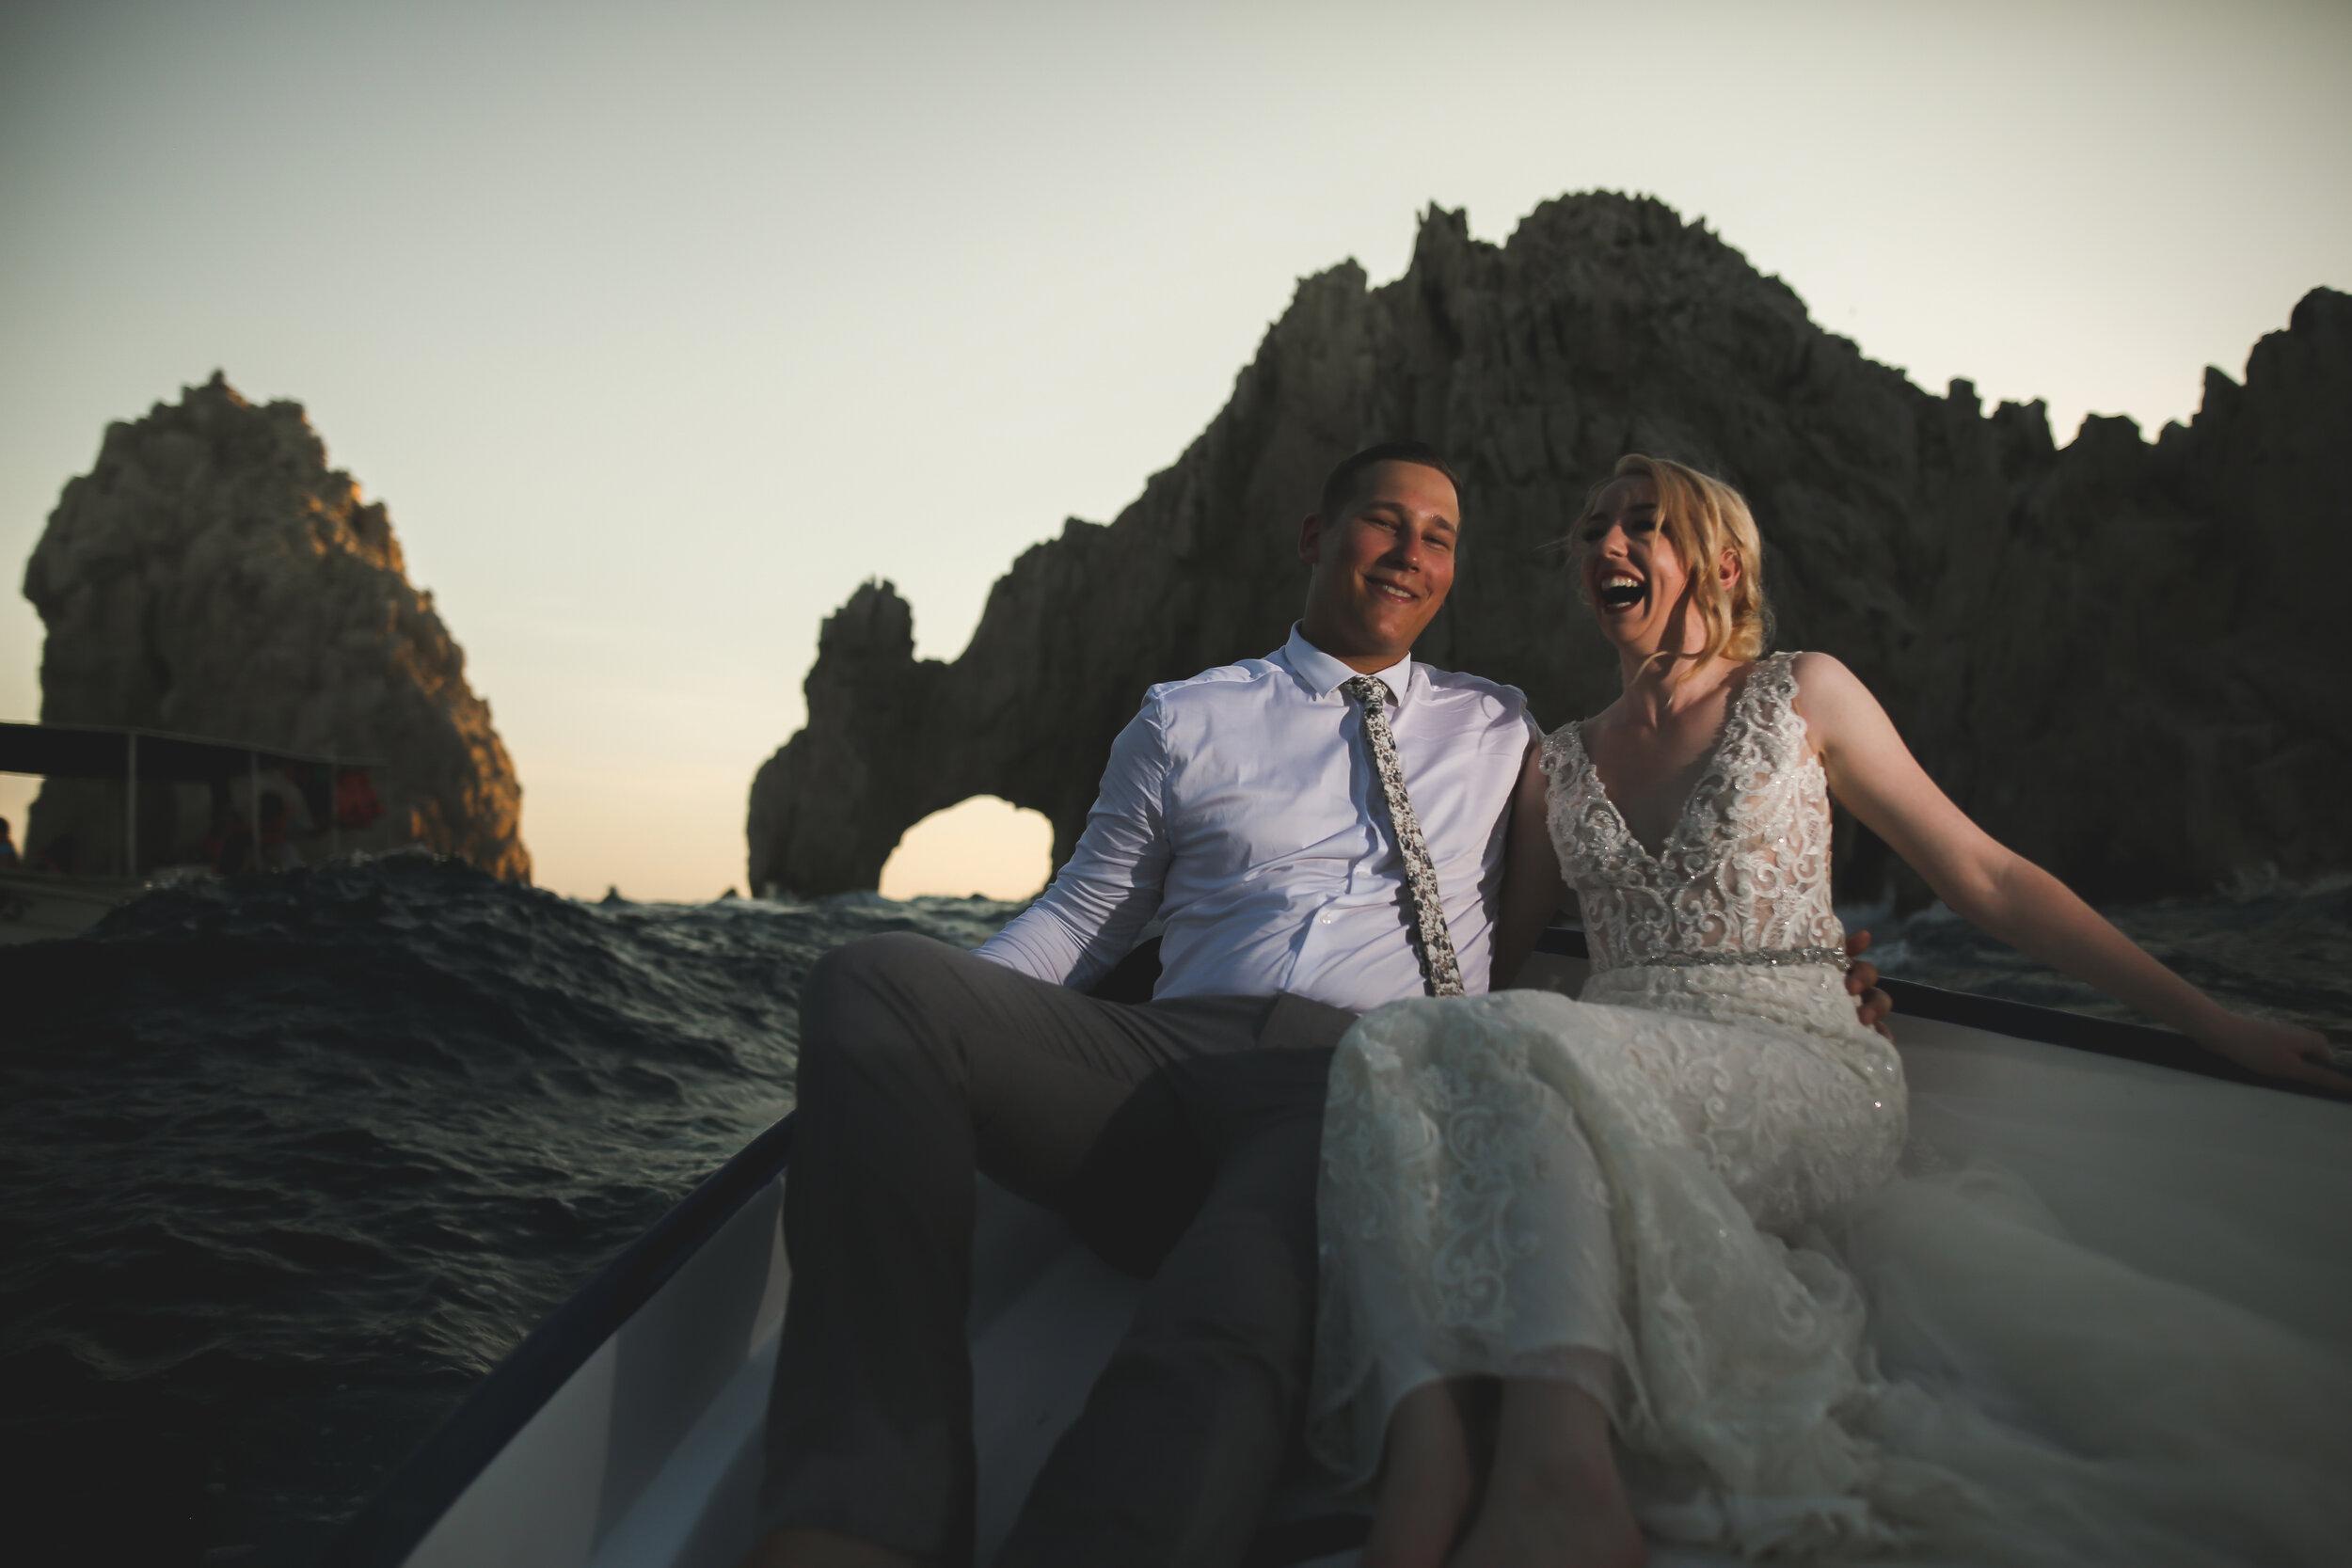 232-Adam-Ziorio-Photography-VictoriaBC-Weddings&Elopements.jpg